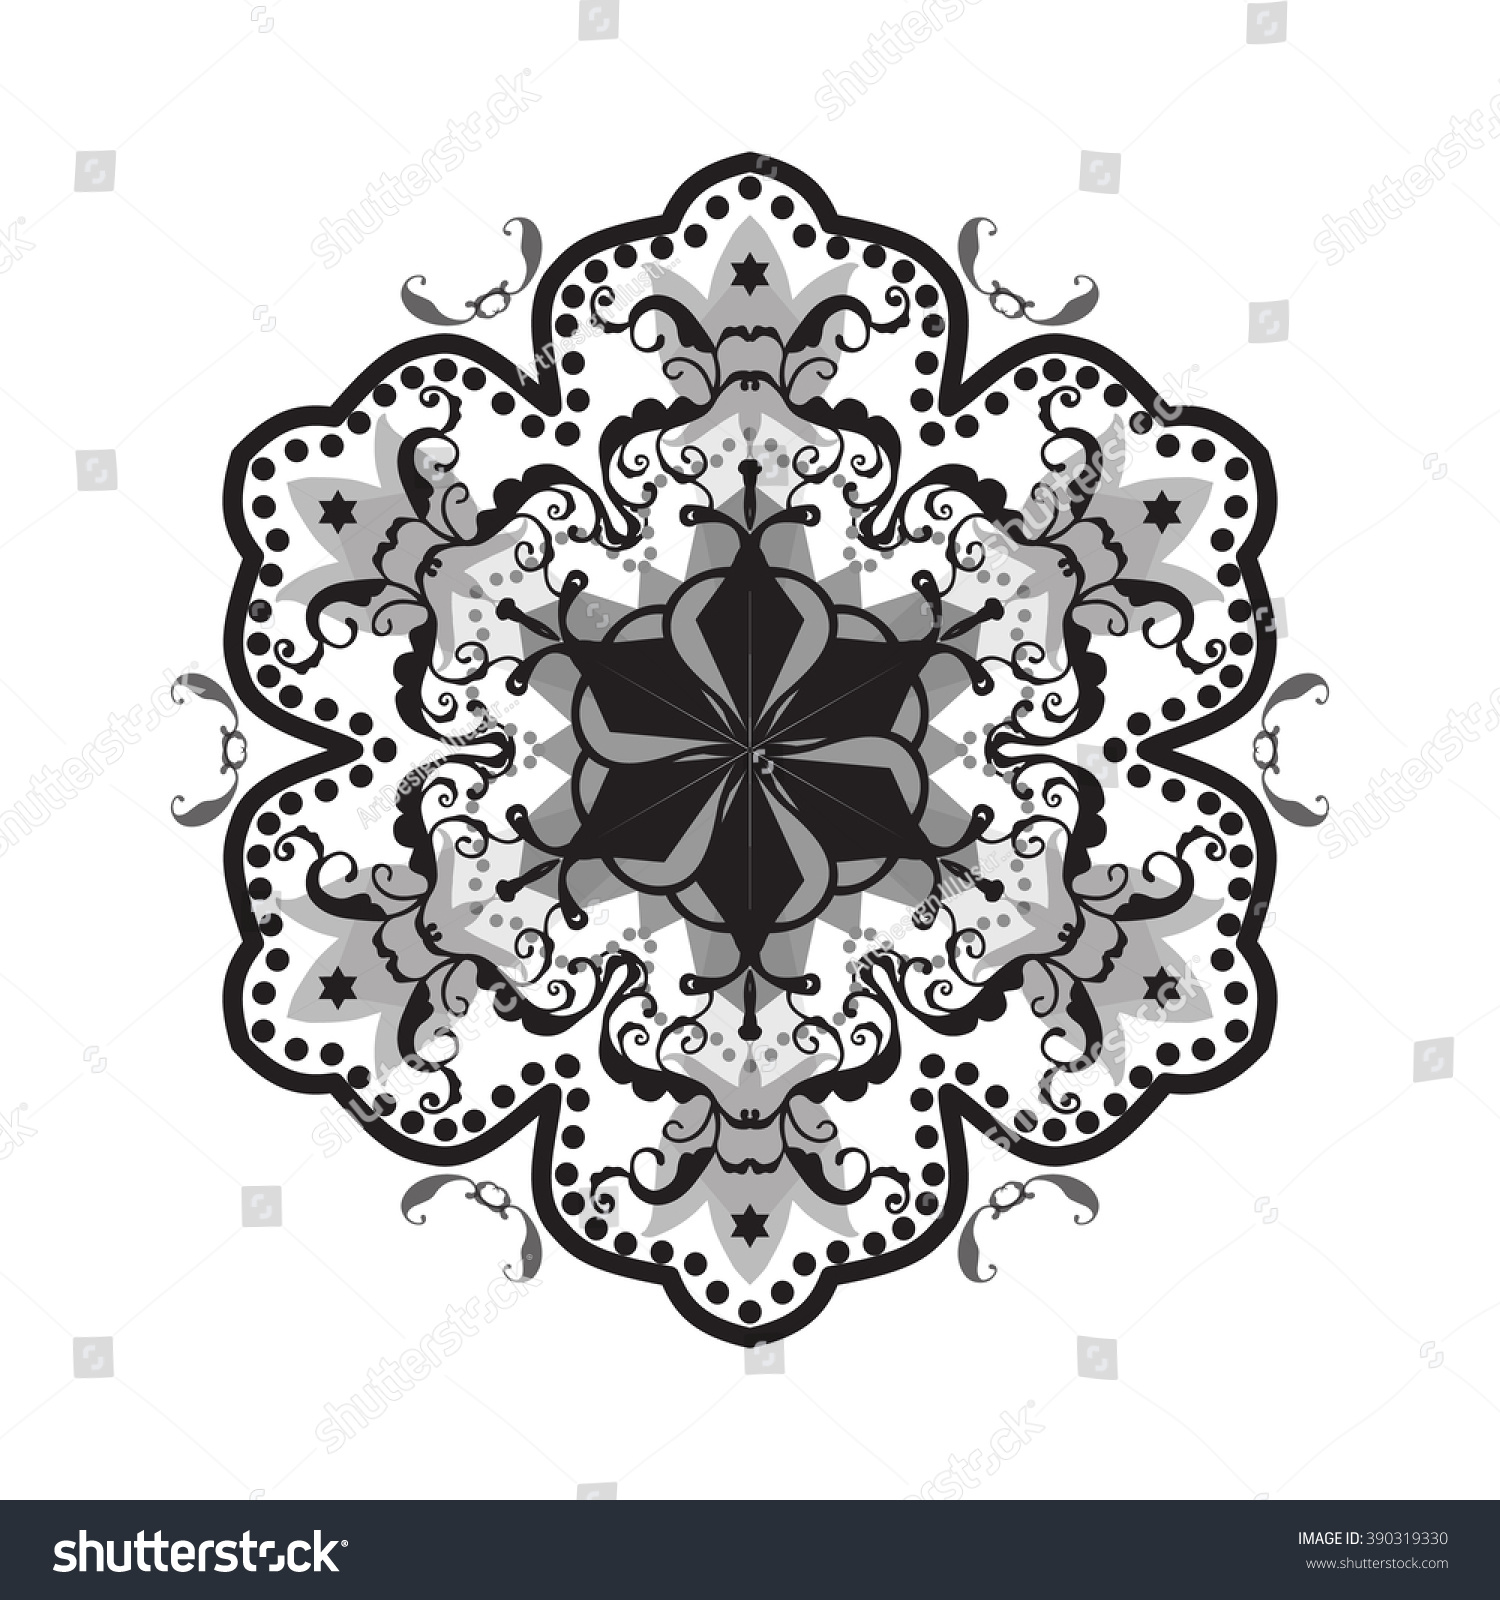 Mandala indian decorative floral pattern ethnic ornament illustration black lotus flower rangoli ornament isolated